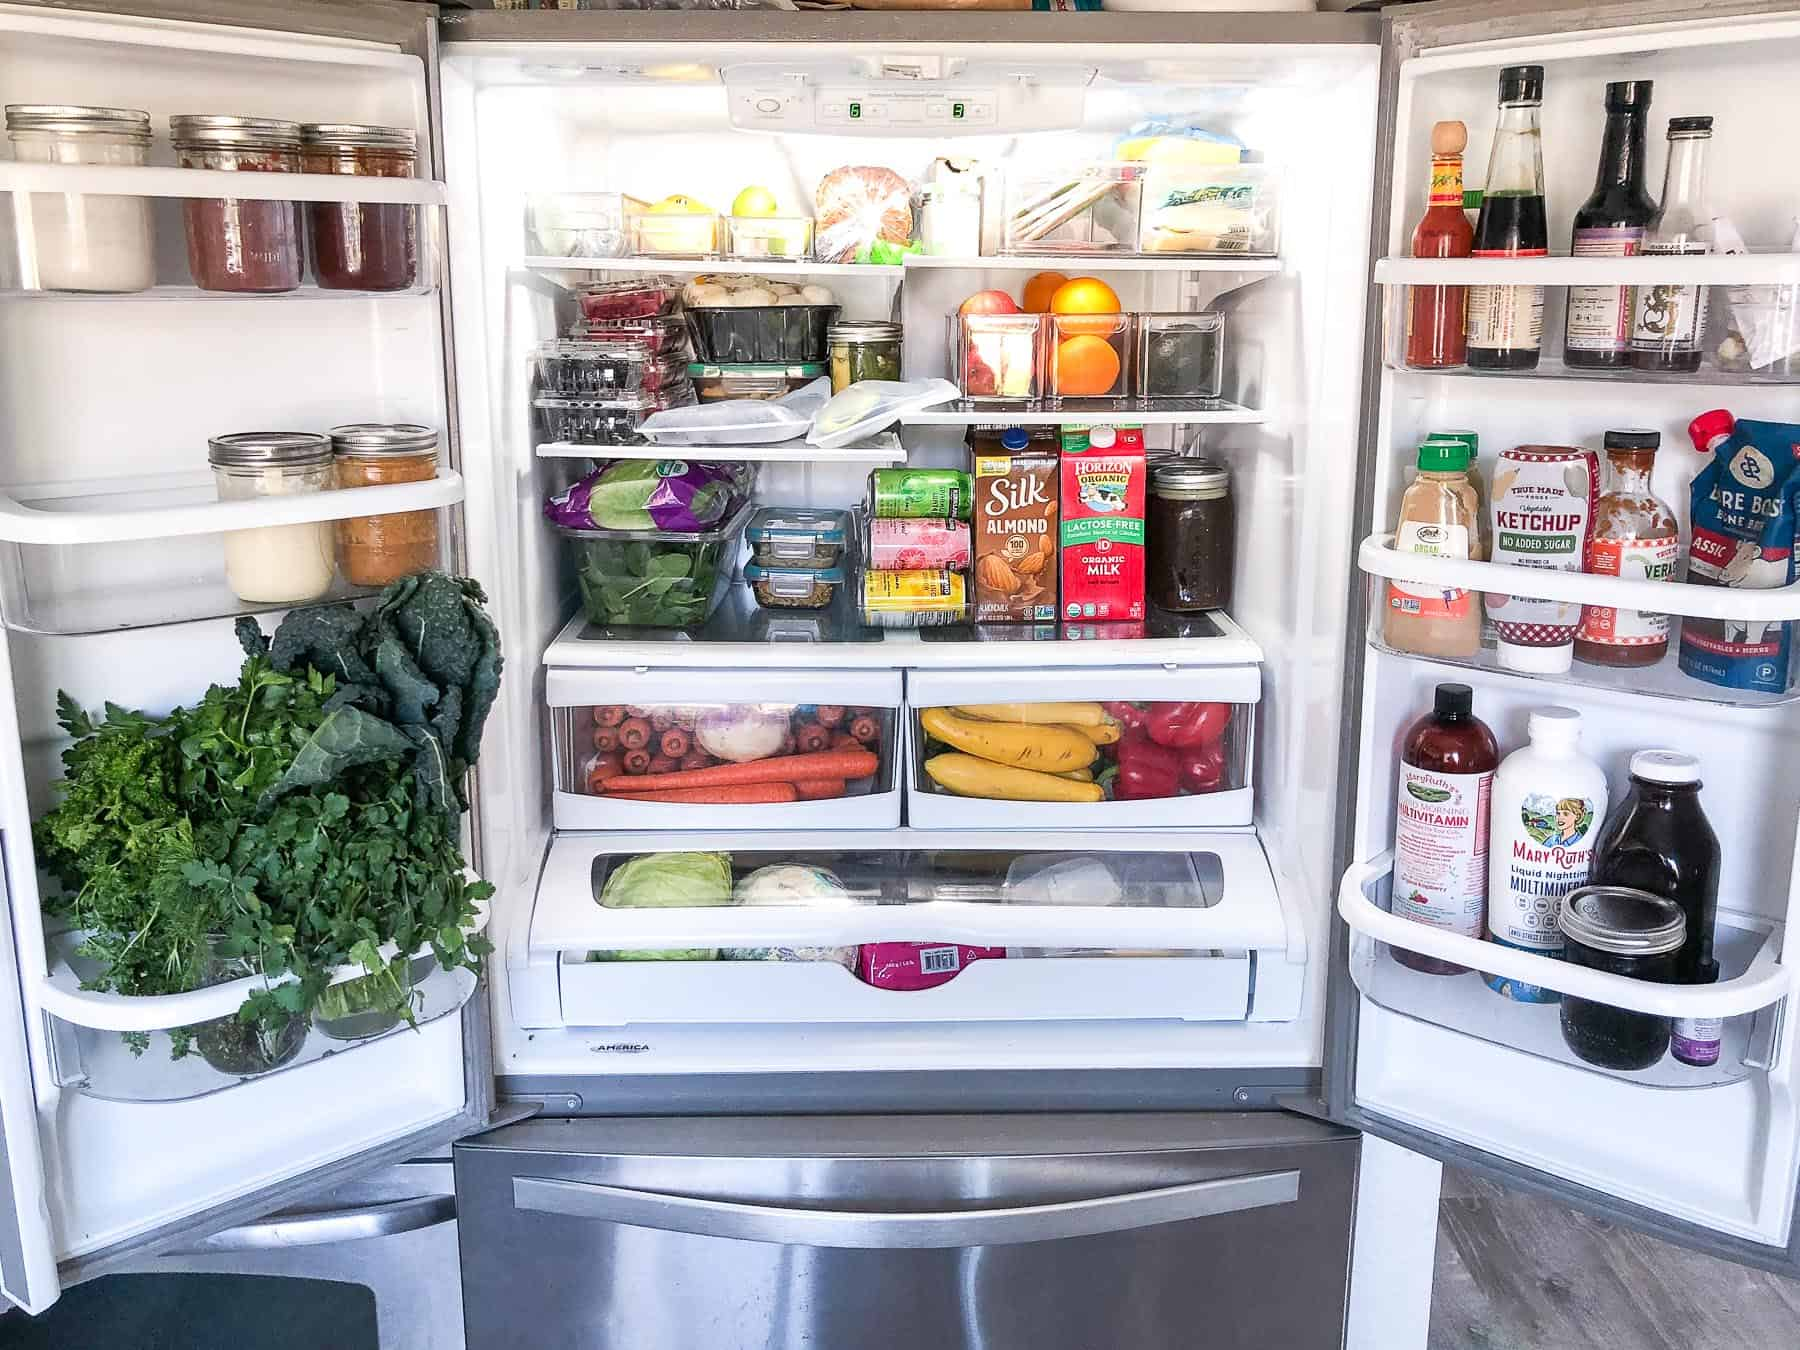 whole30 keto stocked refrigerator